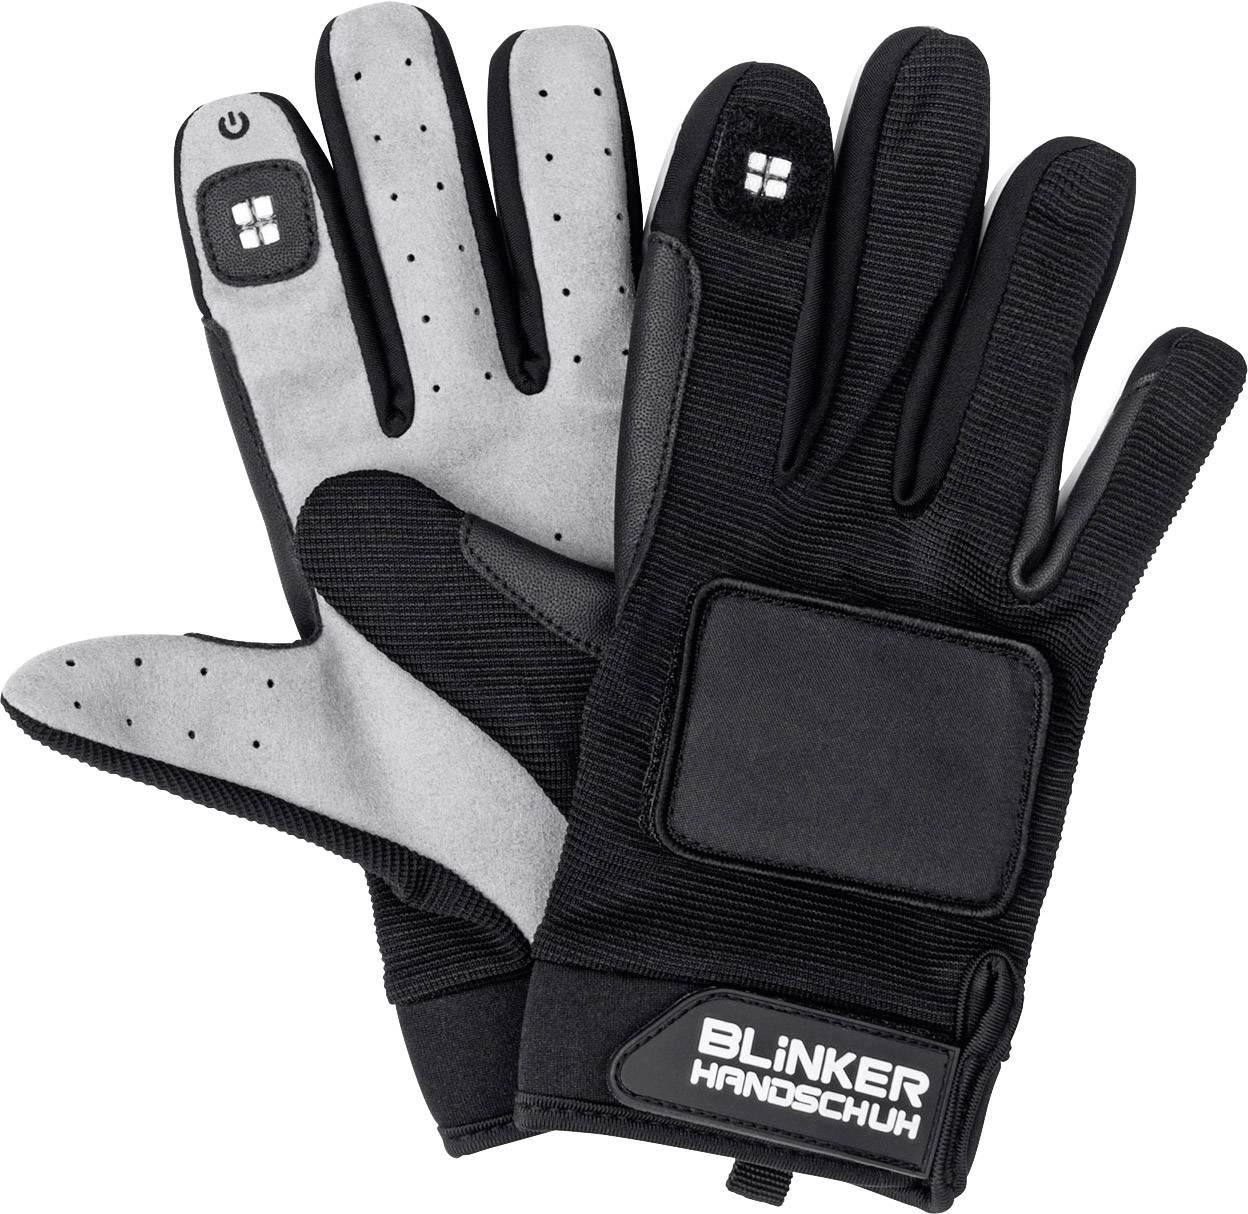 Rukavice a blinkrami Blinker Handschuh 0502, XS/S, 1 pár